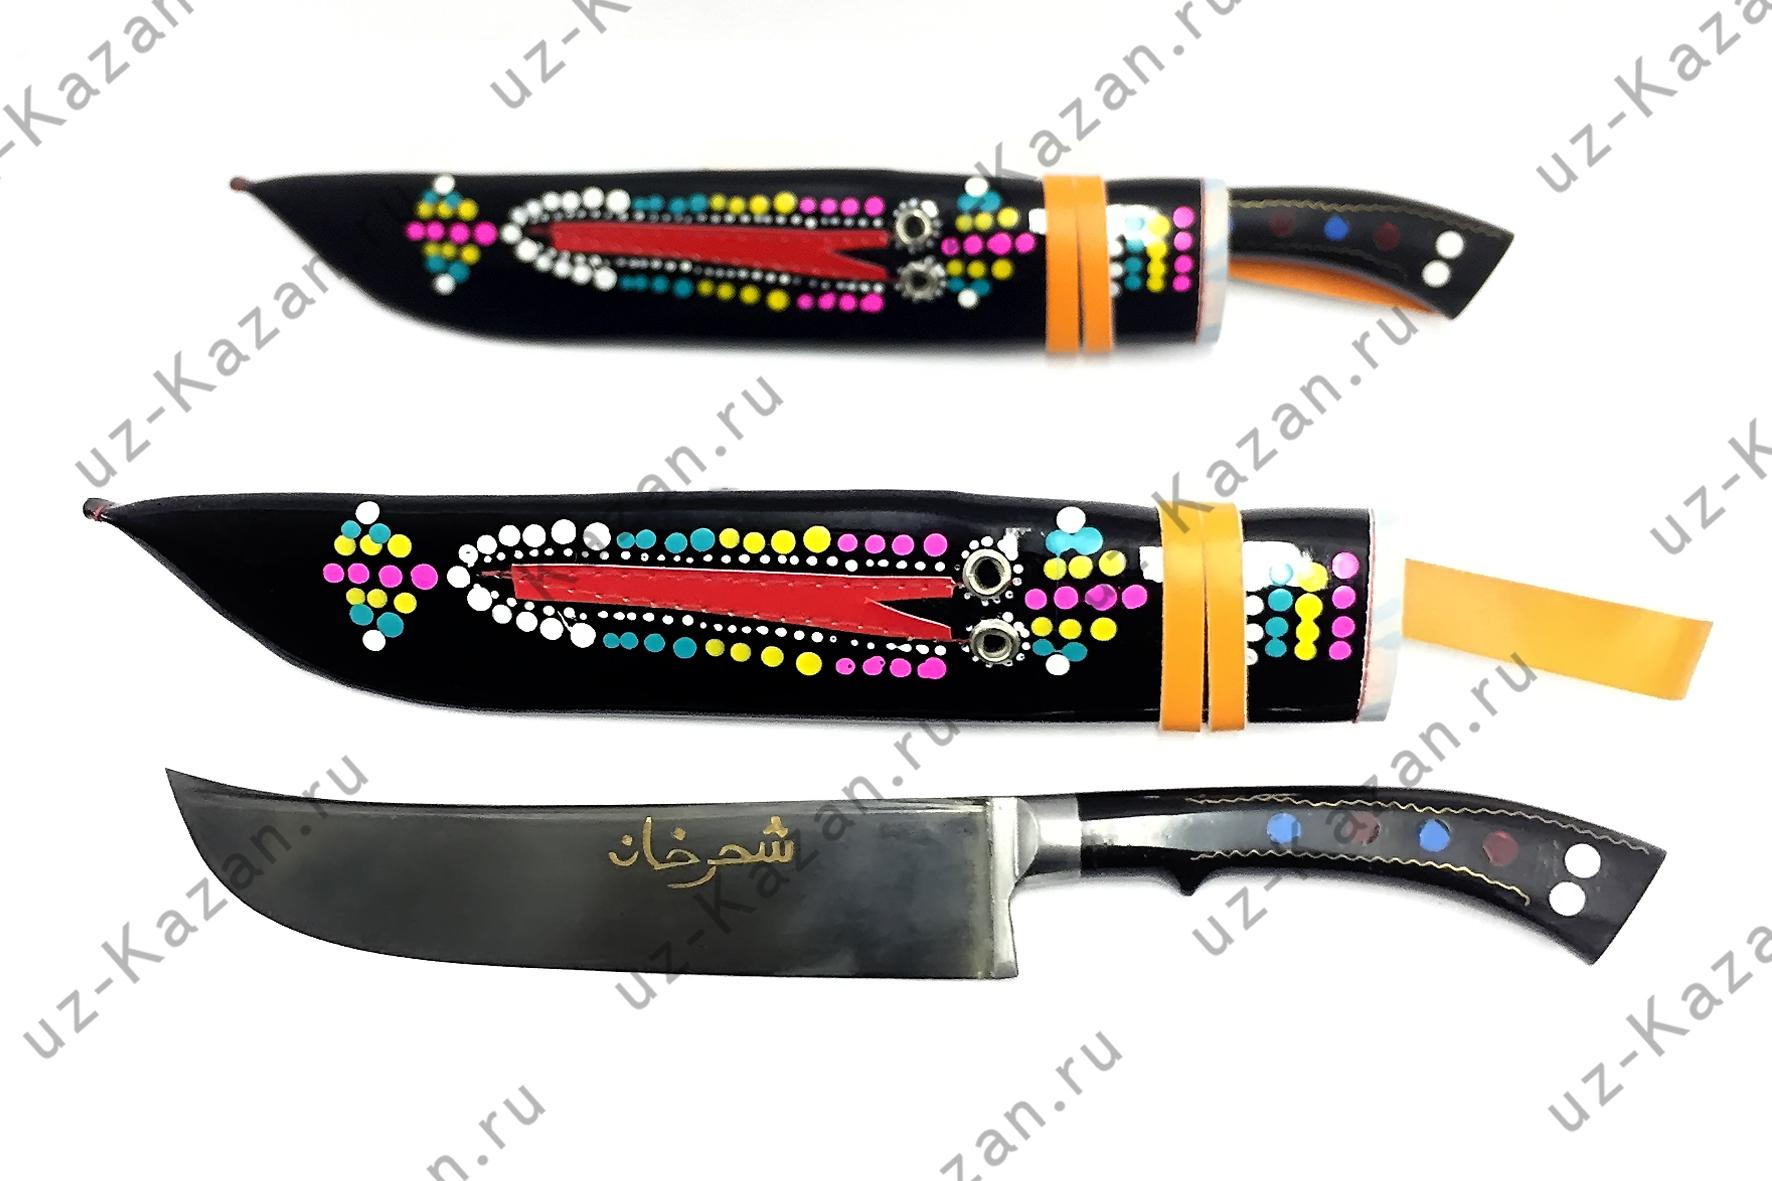 Узбекский нож «Пчак» №81